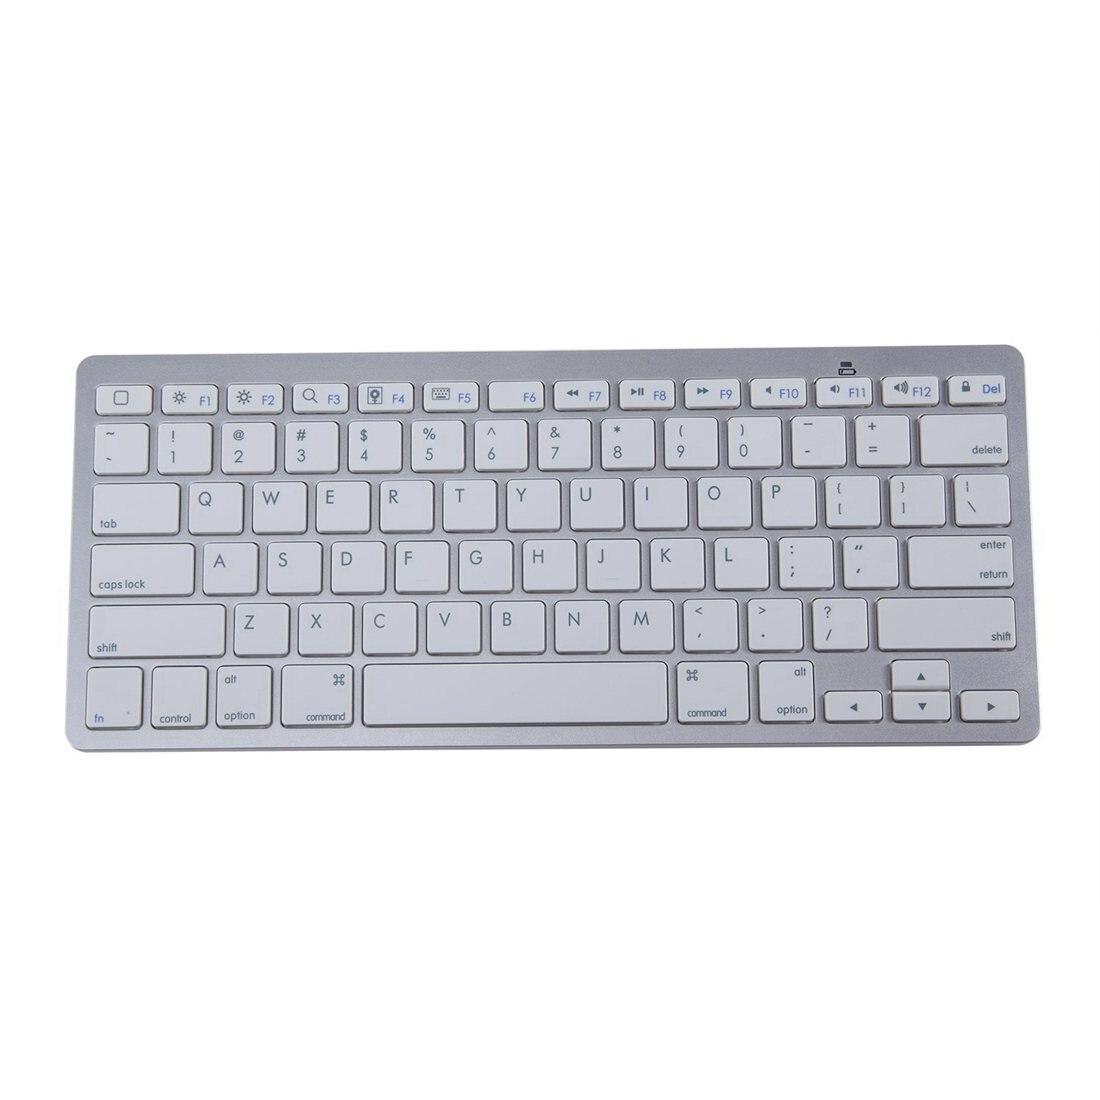 450 Ultra Thin Portable Standard 78-Key Wireless Bluetooth Keyboard For Ipad Iphone MAC PC (Silver)